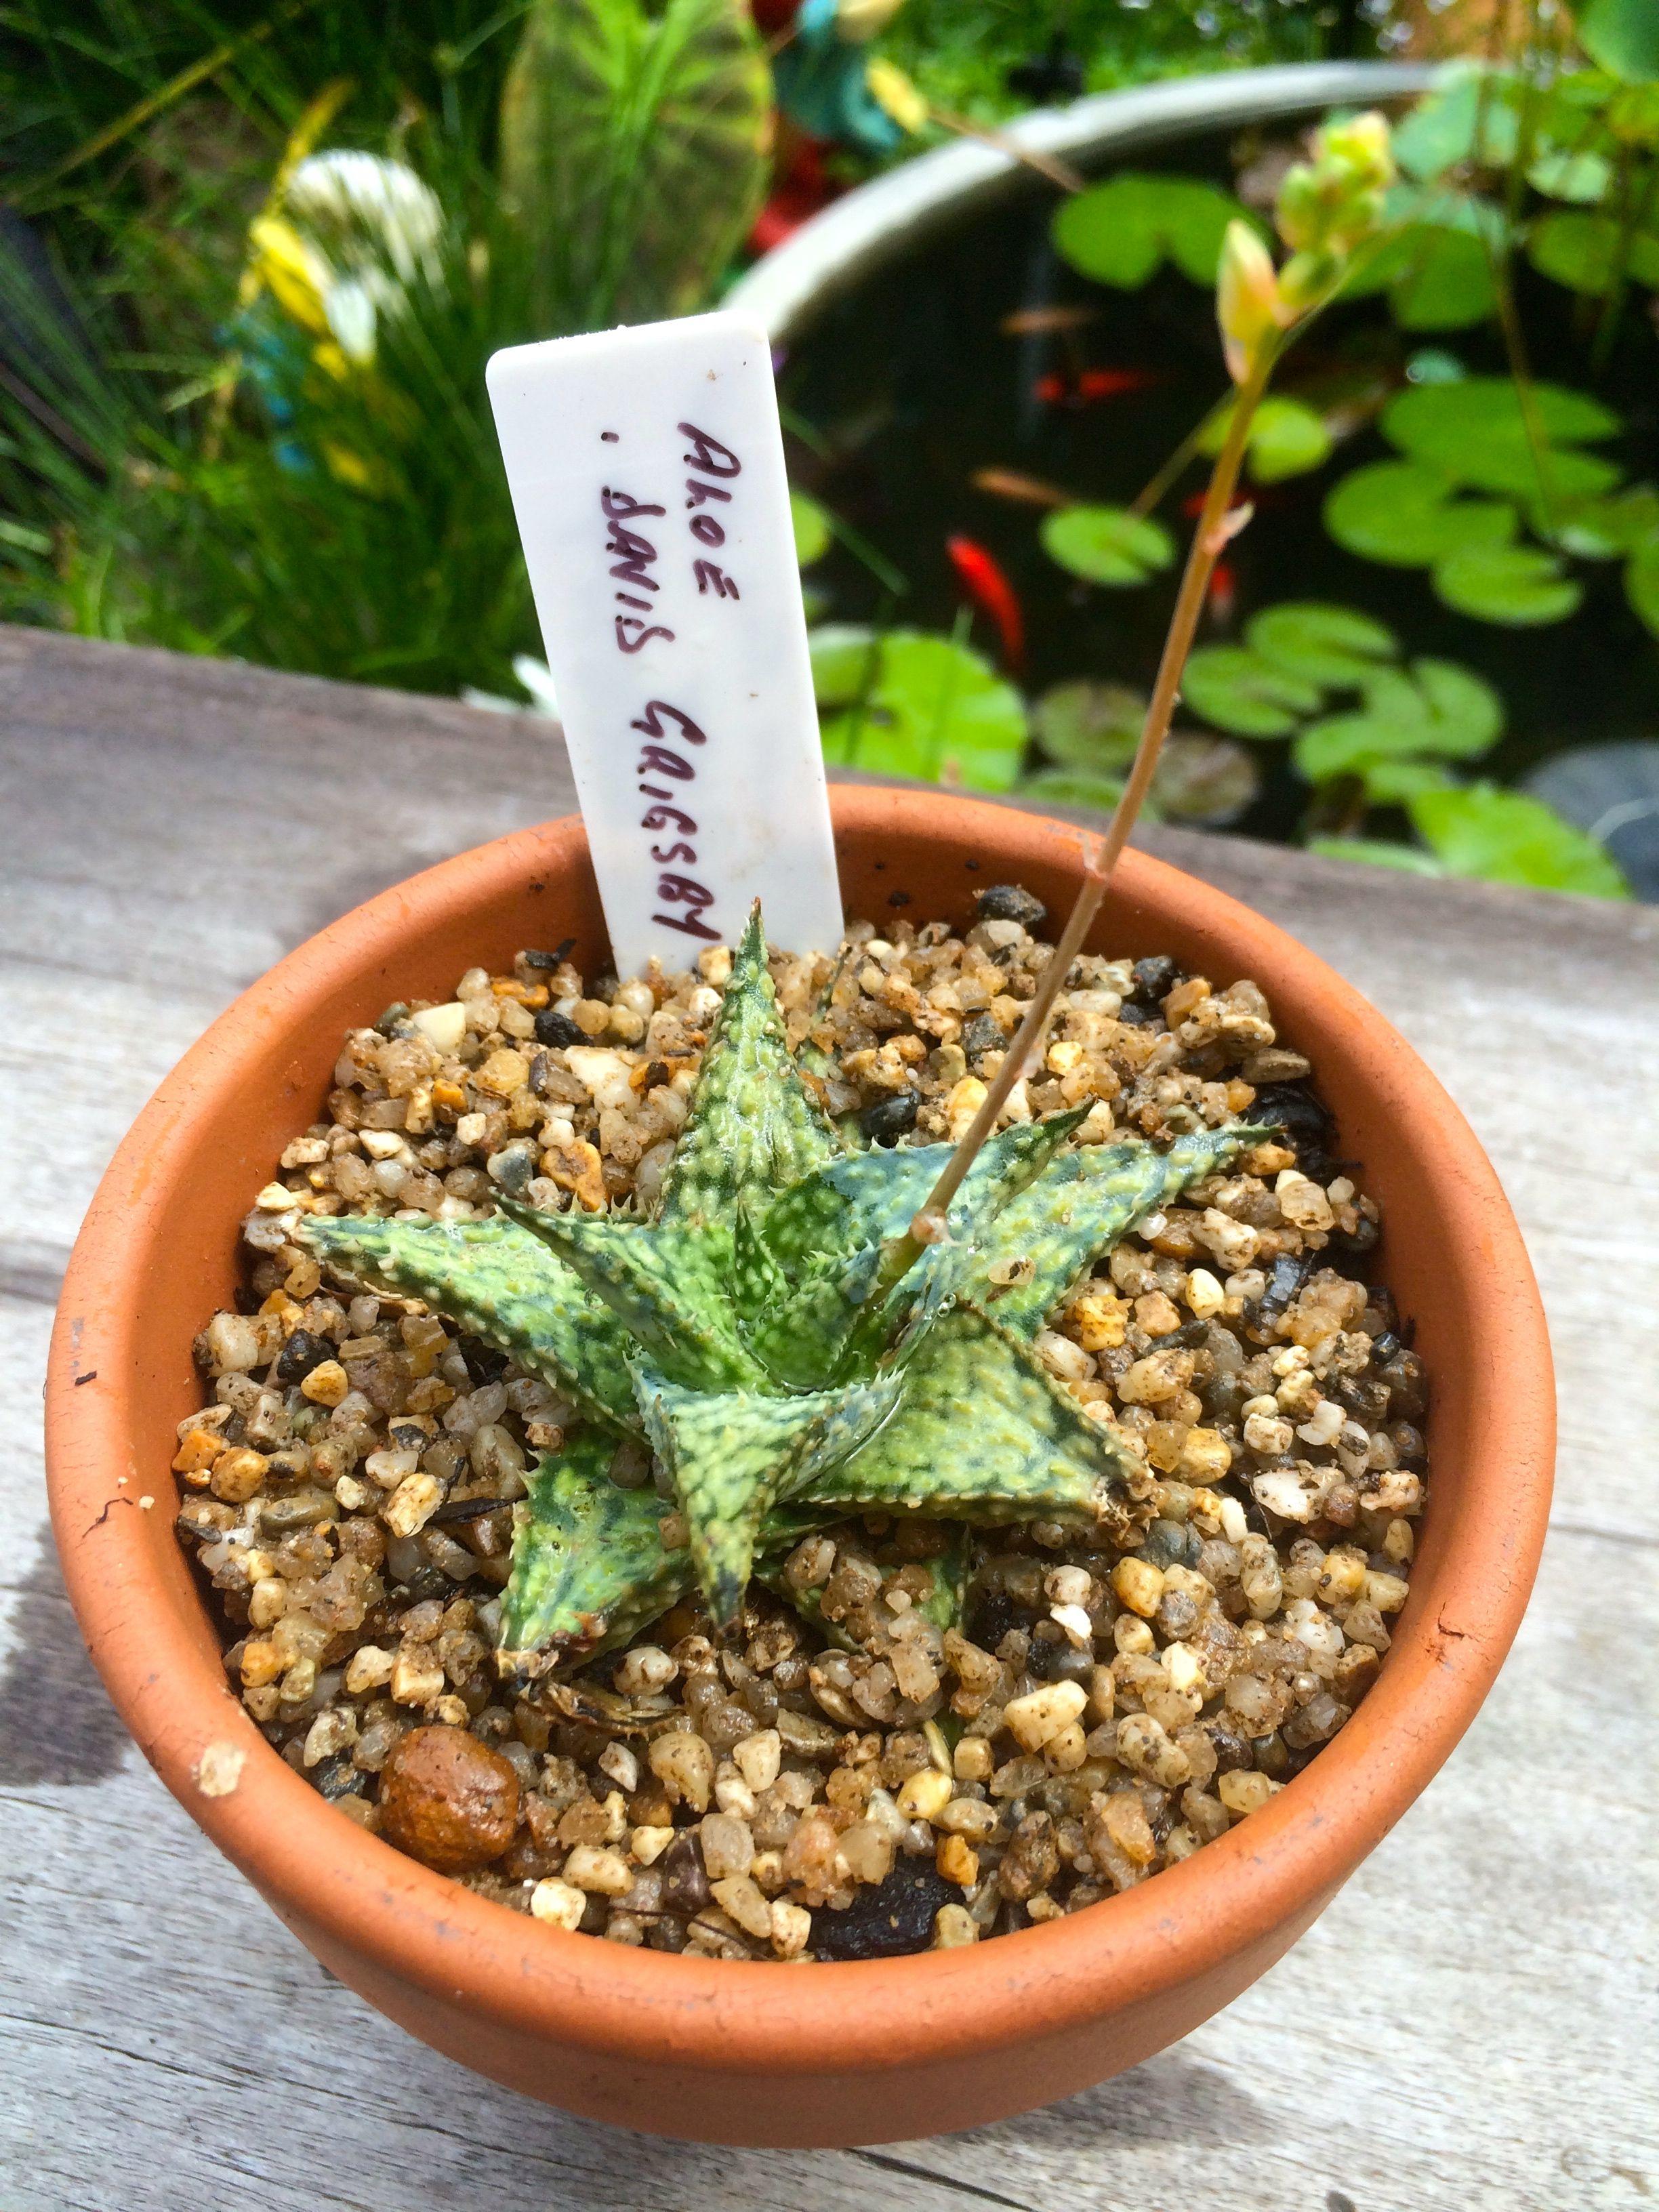 Aloe 'David Grigsby'. #succulents #Aloe